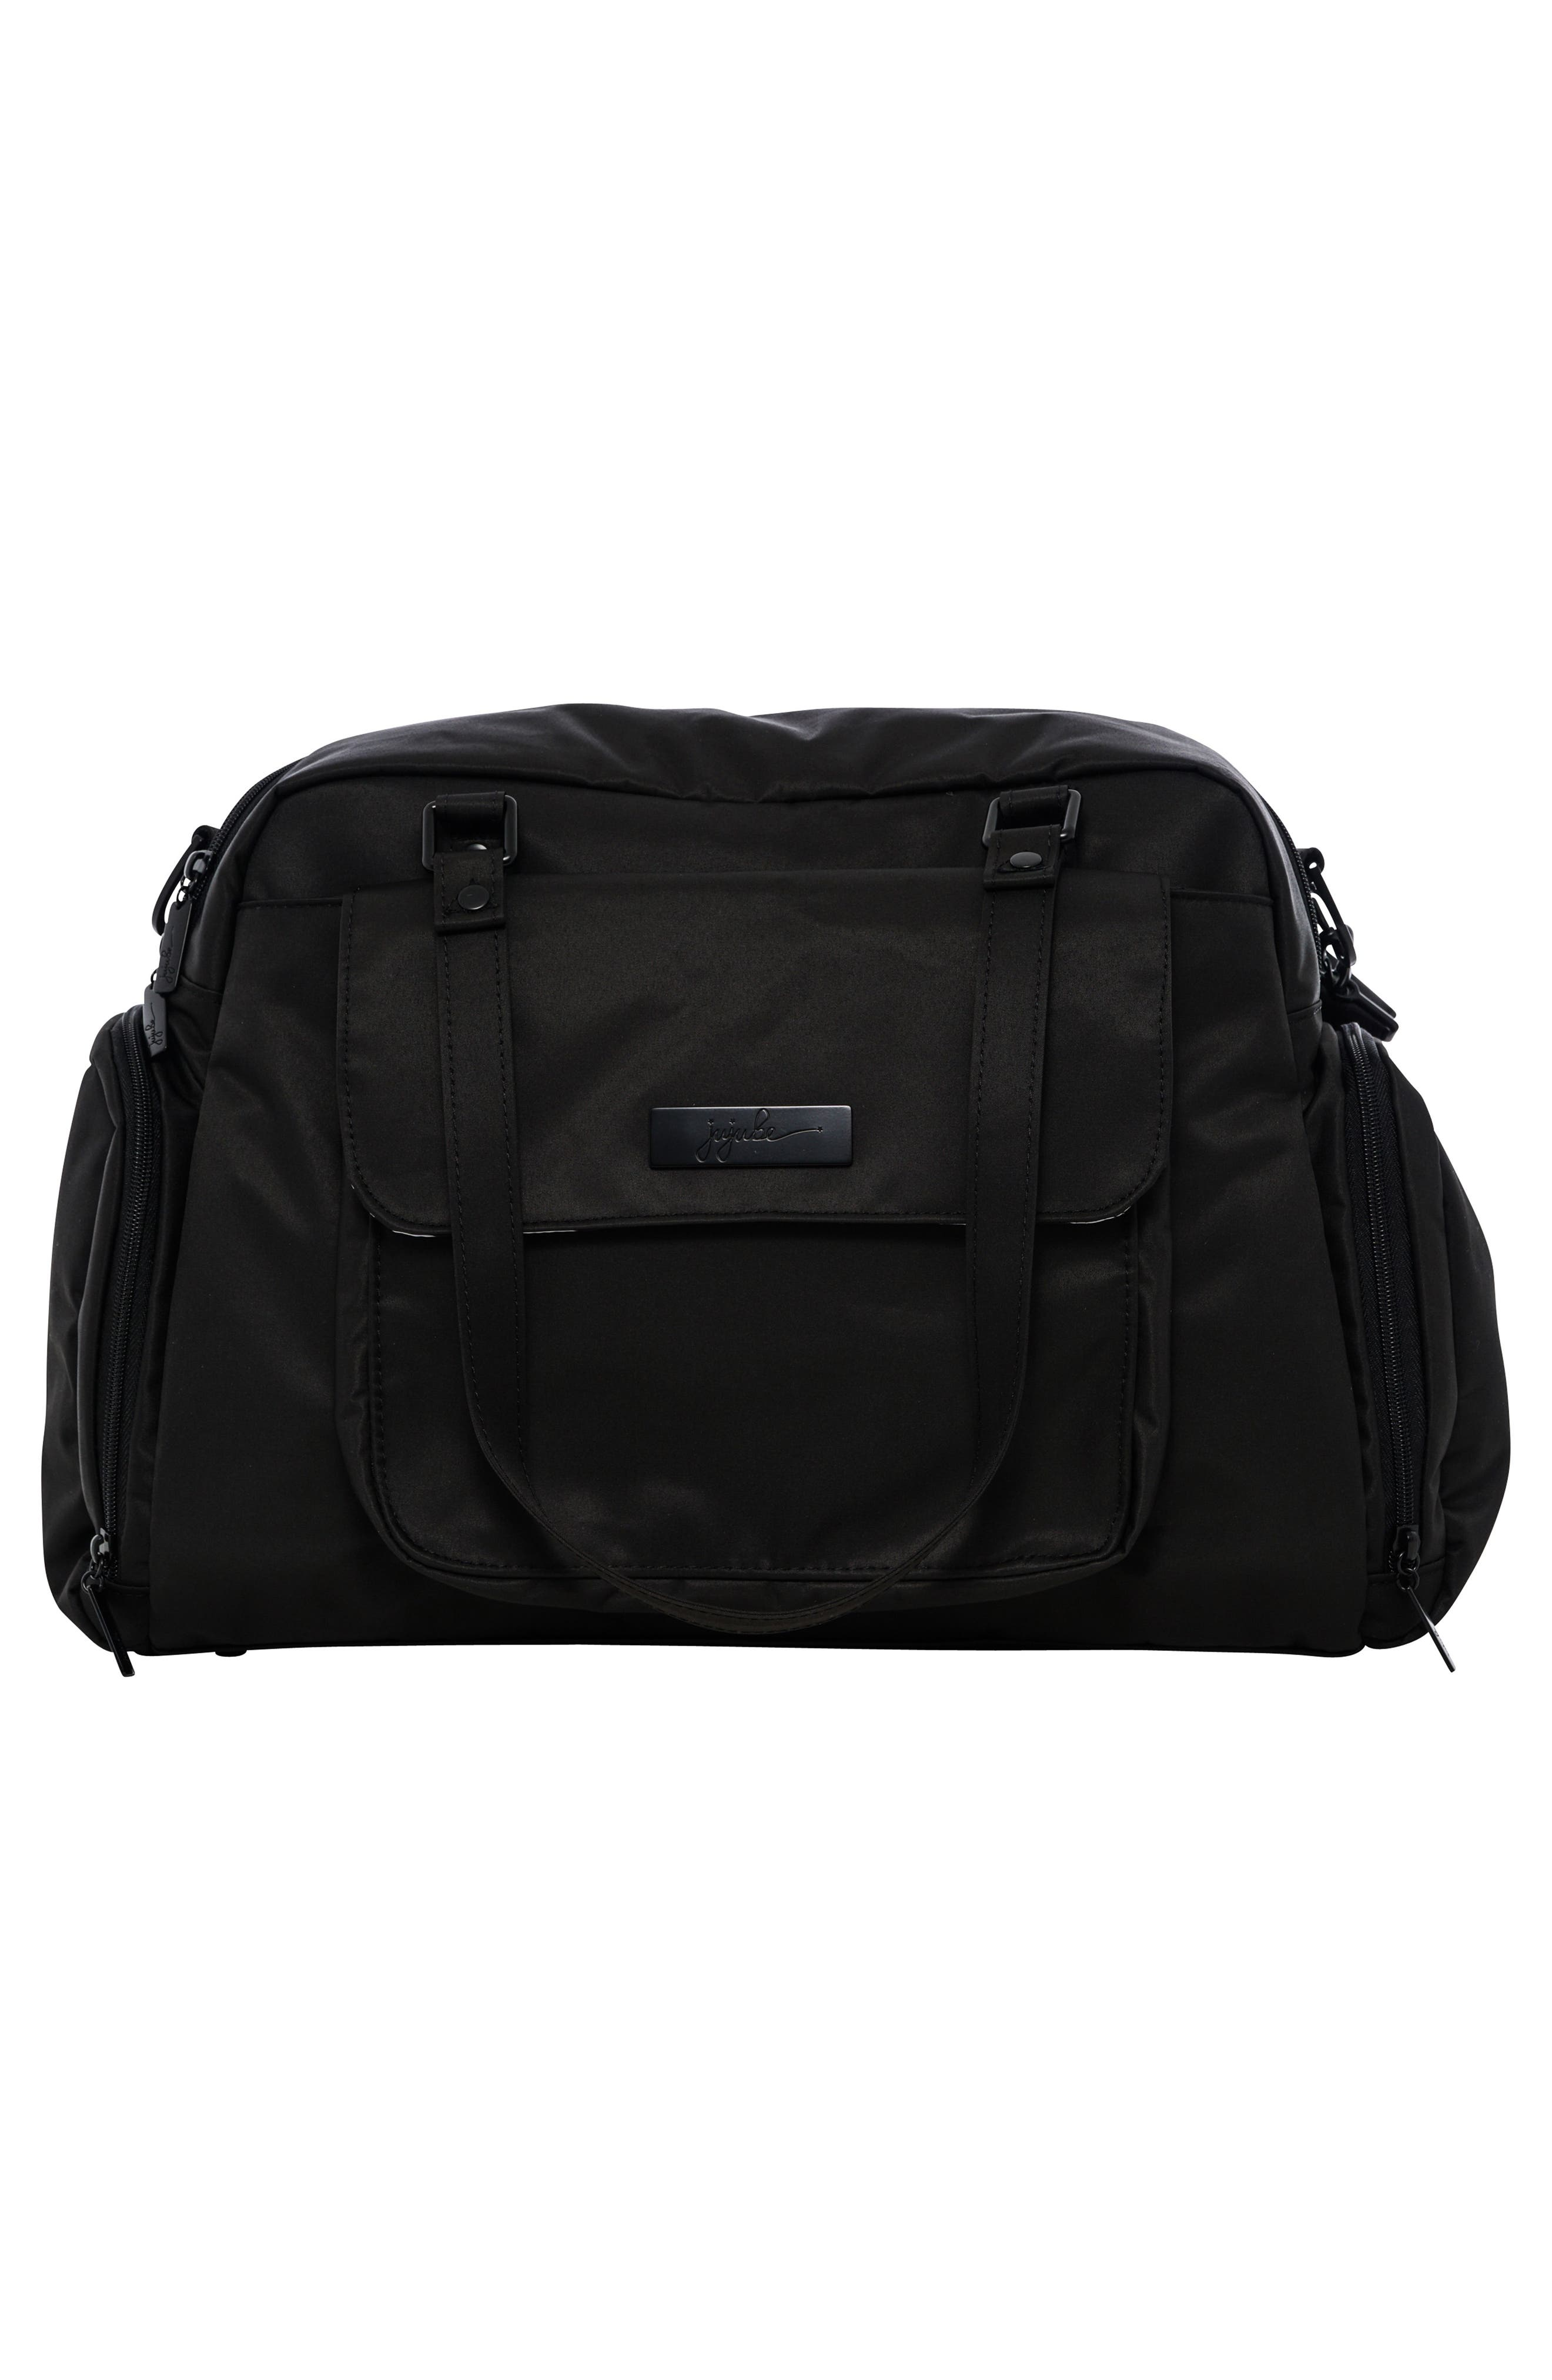 Onyx Be Pumped Bag,                             Alternate thumbnail 6, color,                             Black Out